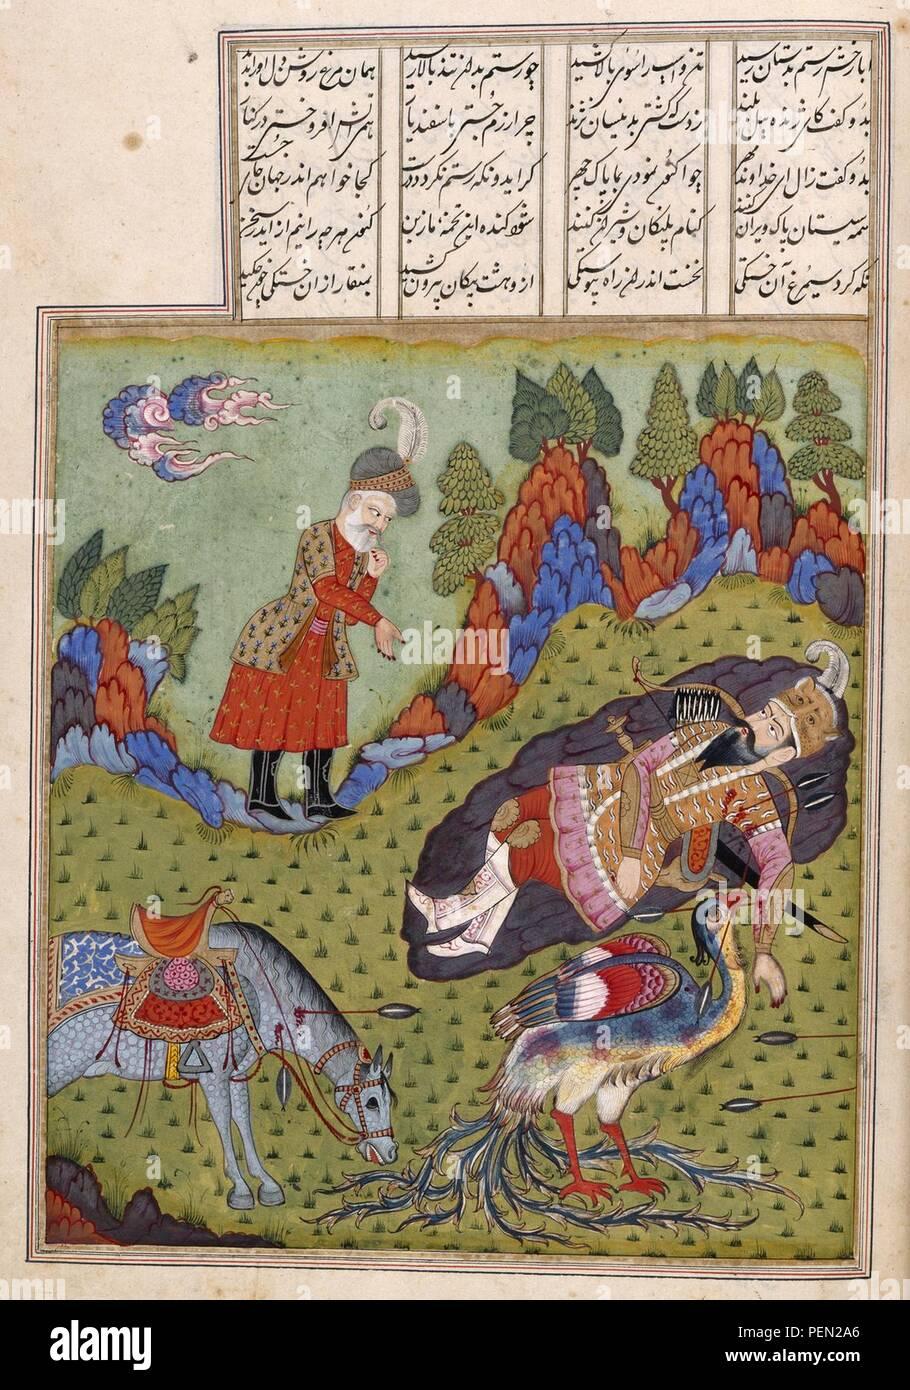 Shahnama. - caption  'The simurgh healing Rustam' - Stock Image